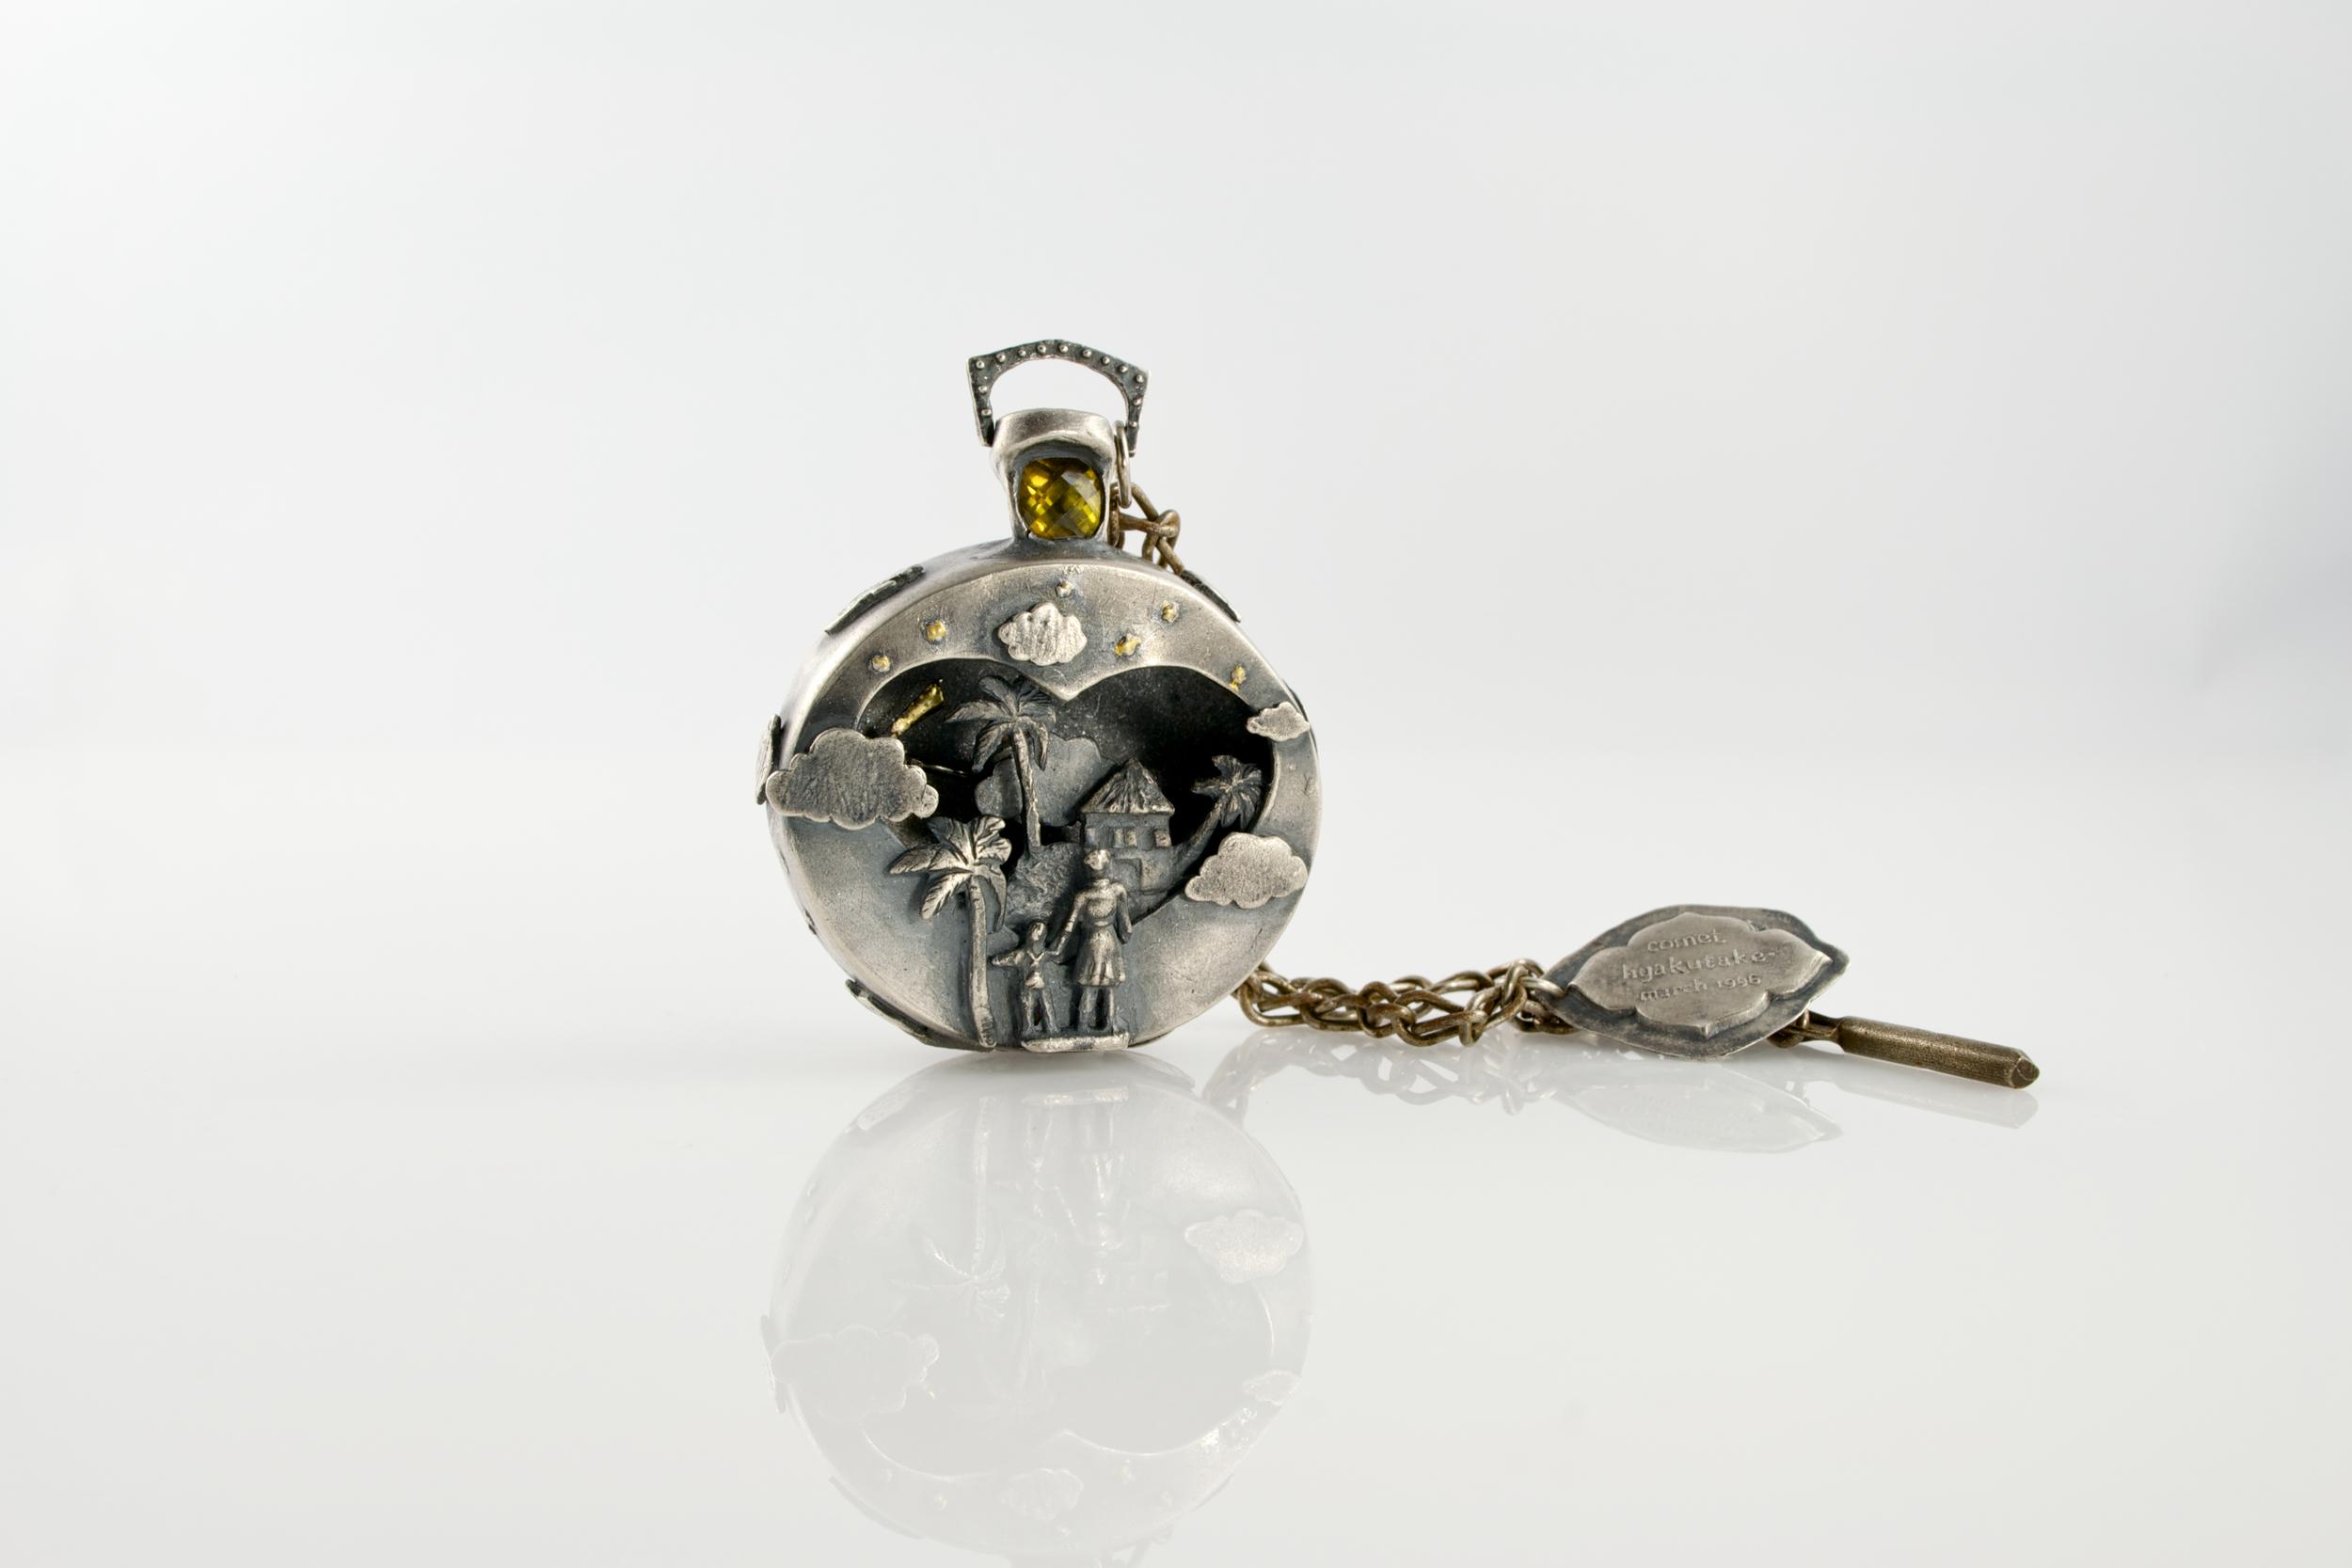 Mechanical timepiece pendant  ; silver, 18k, 24k, brass, olivine, found object; 2012-13